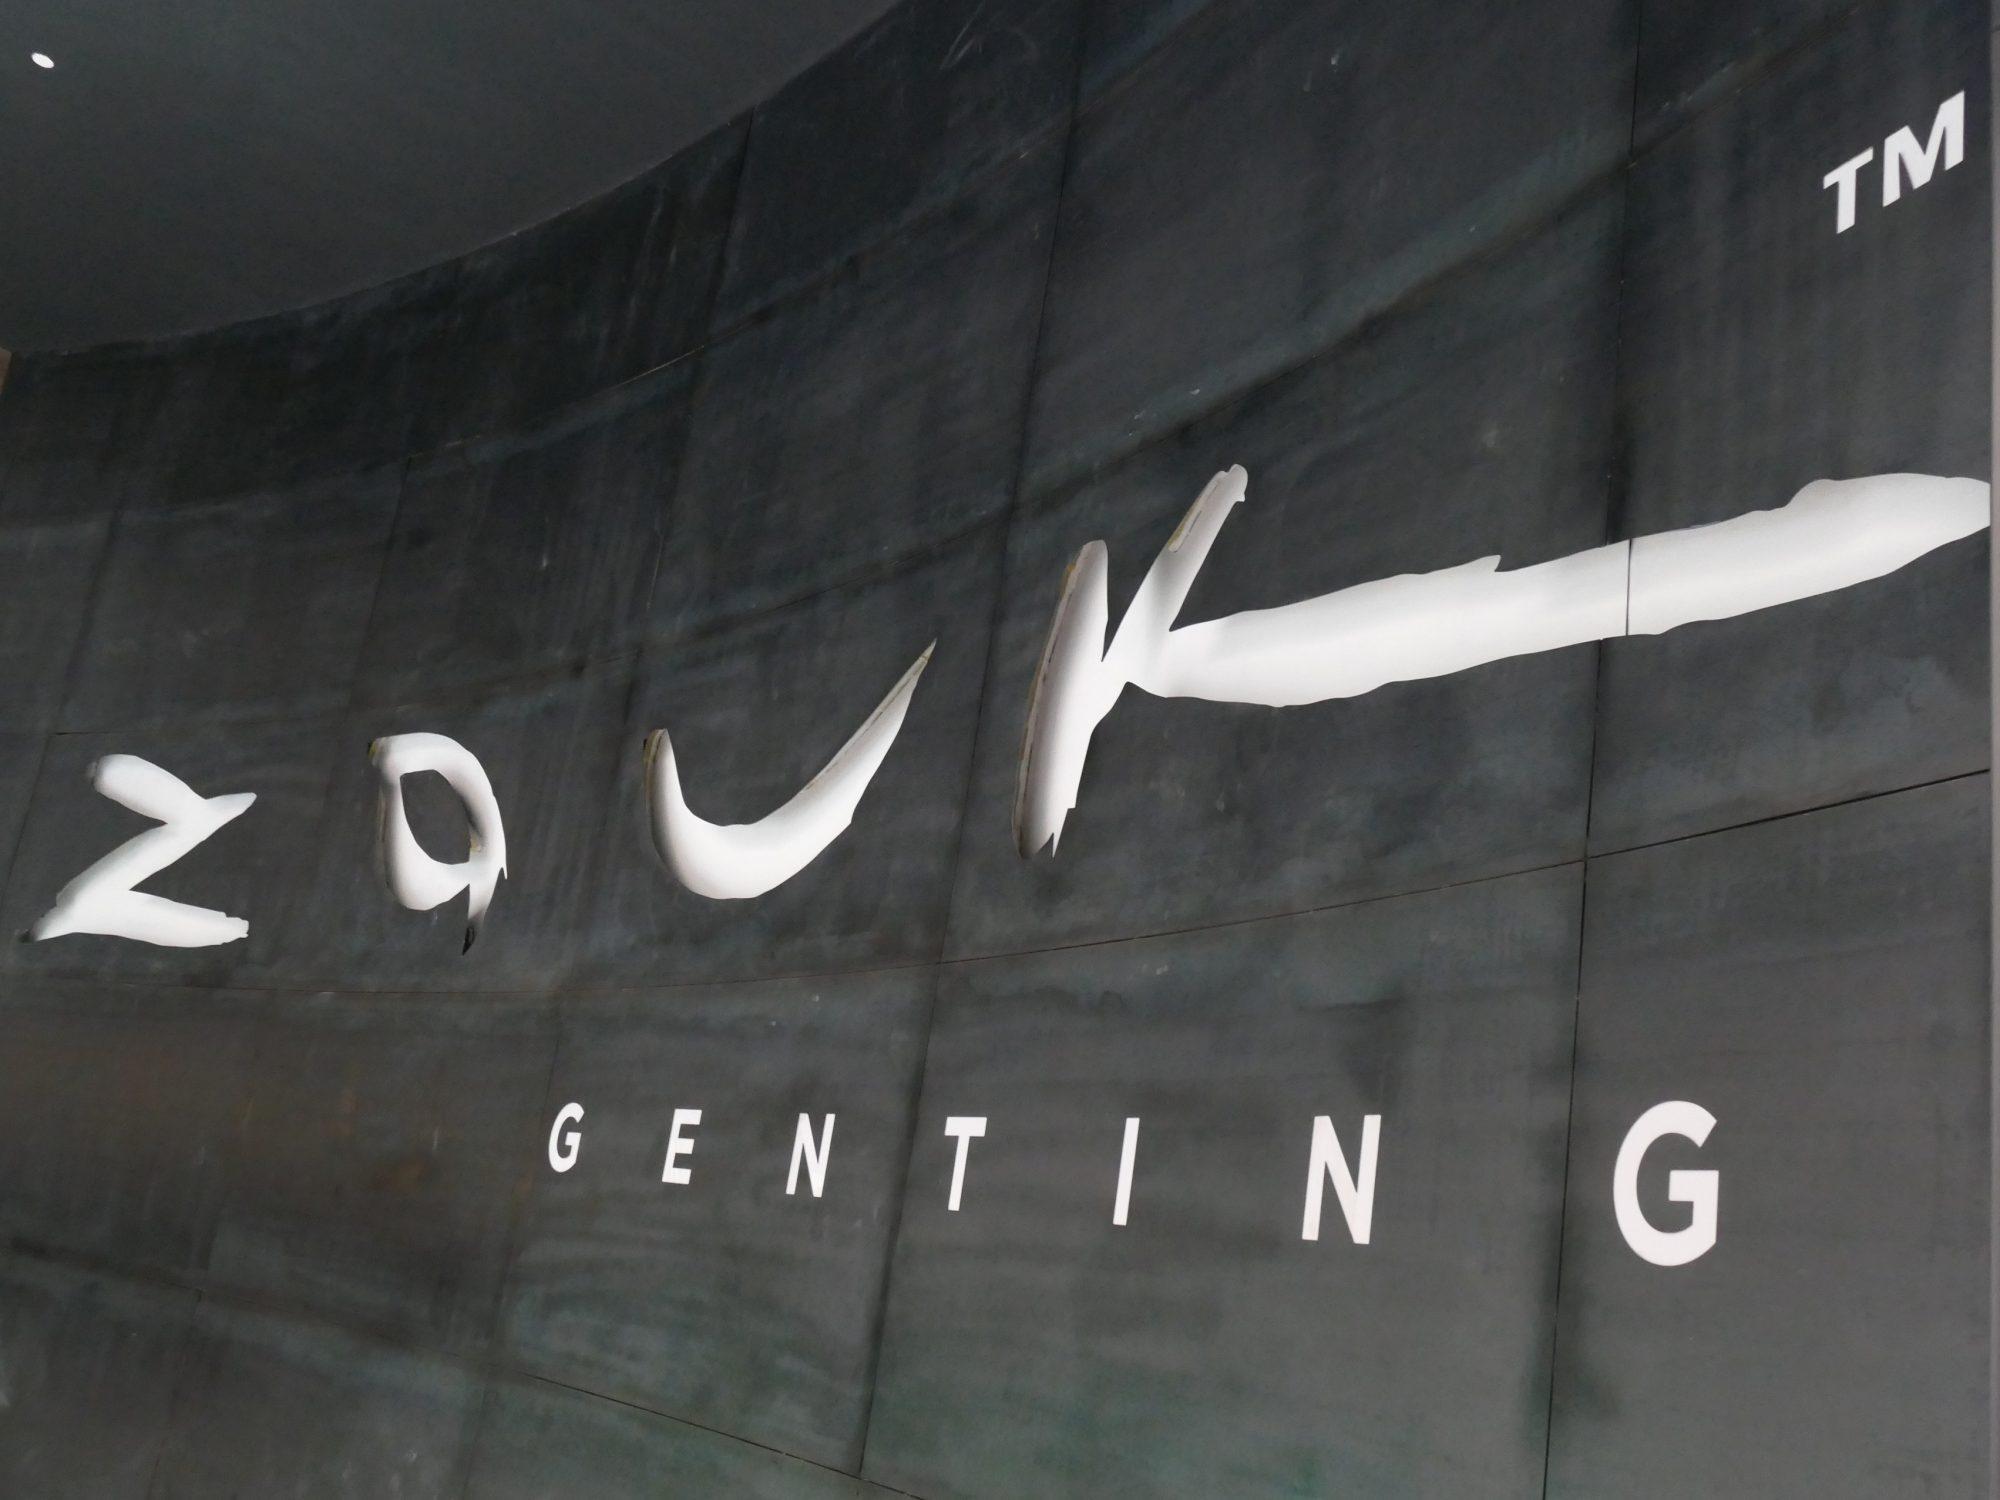 Zouk Genting entrance